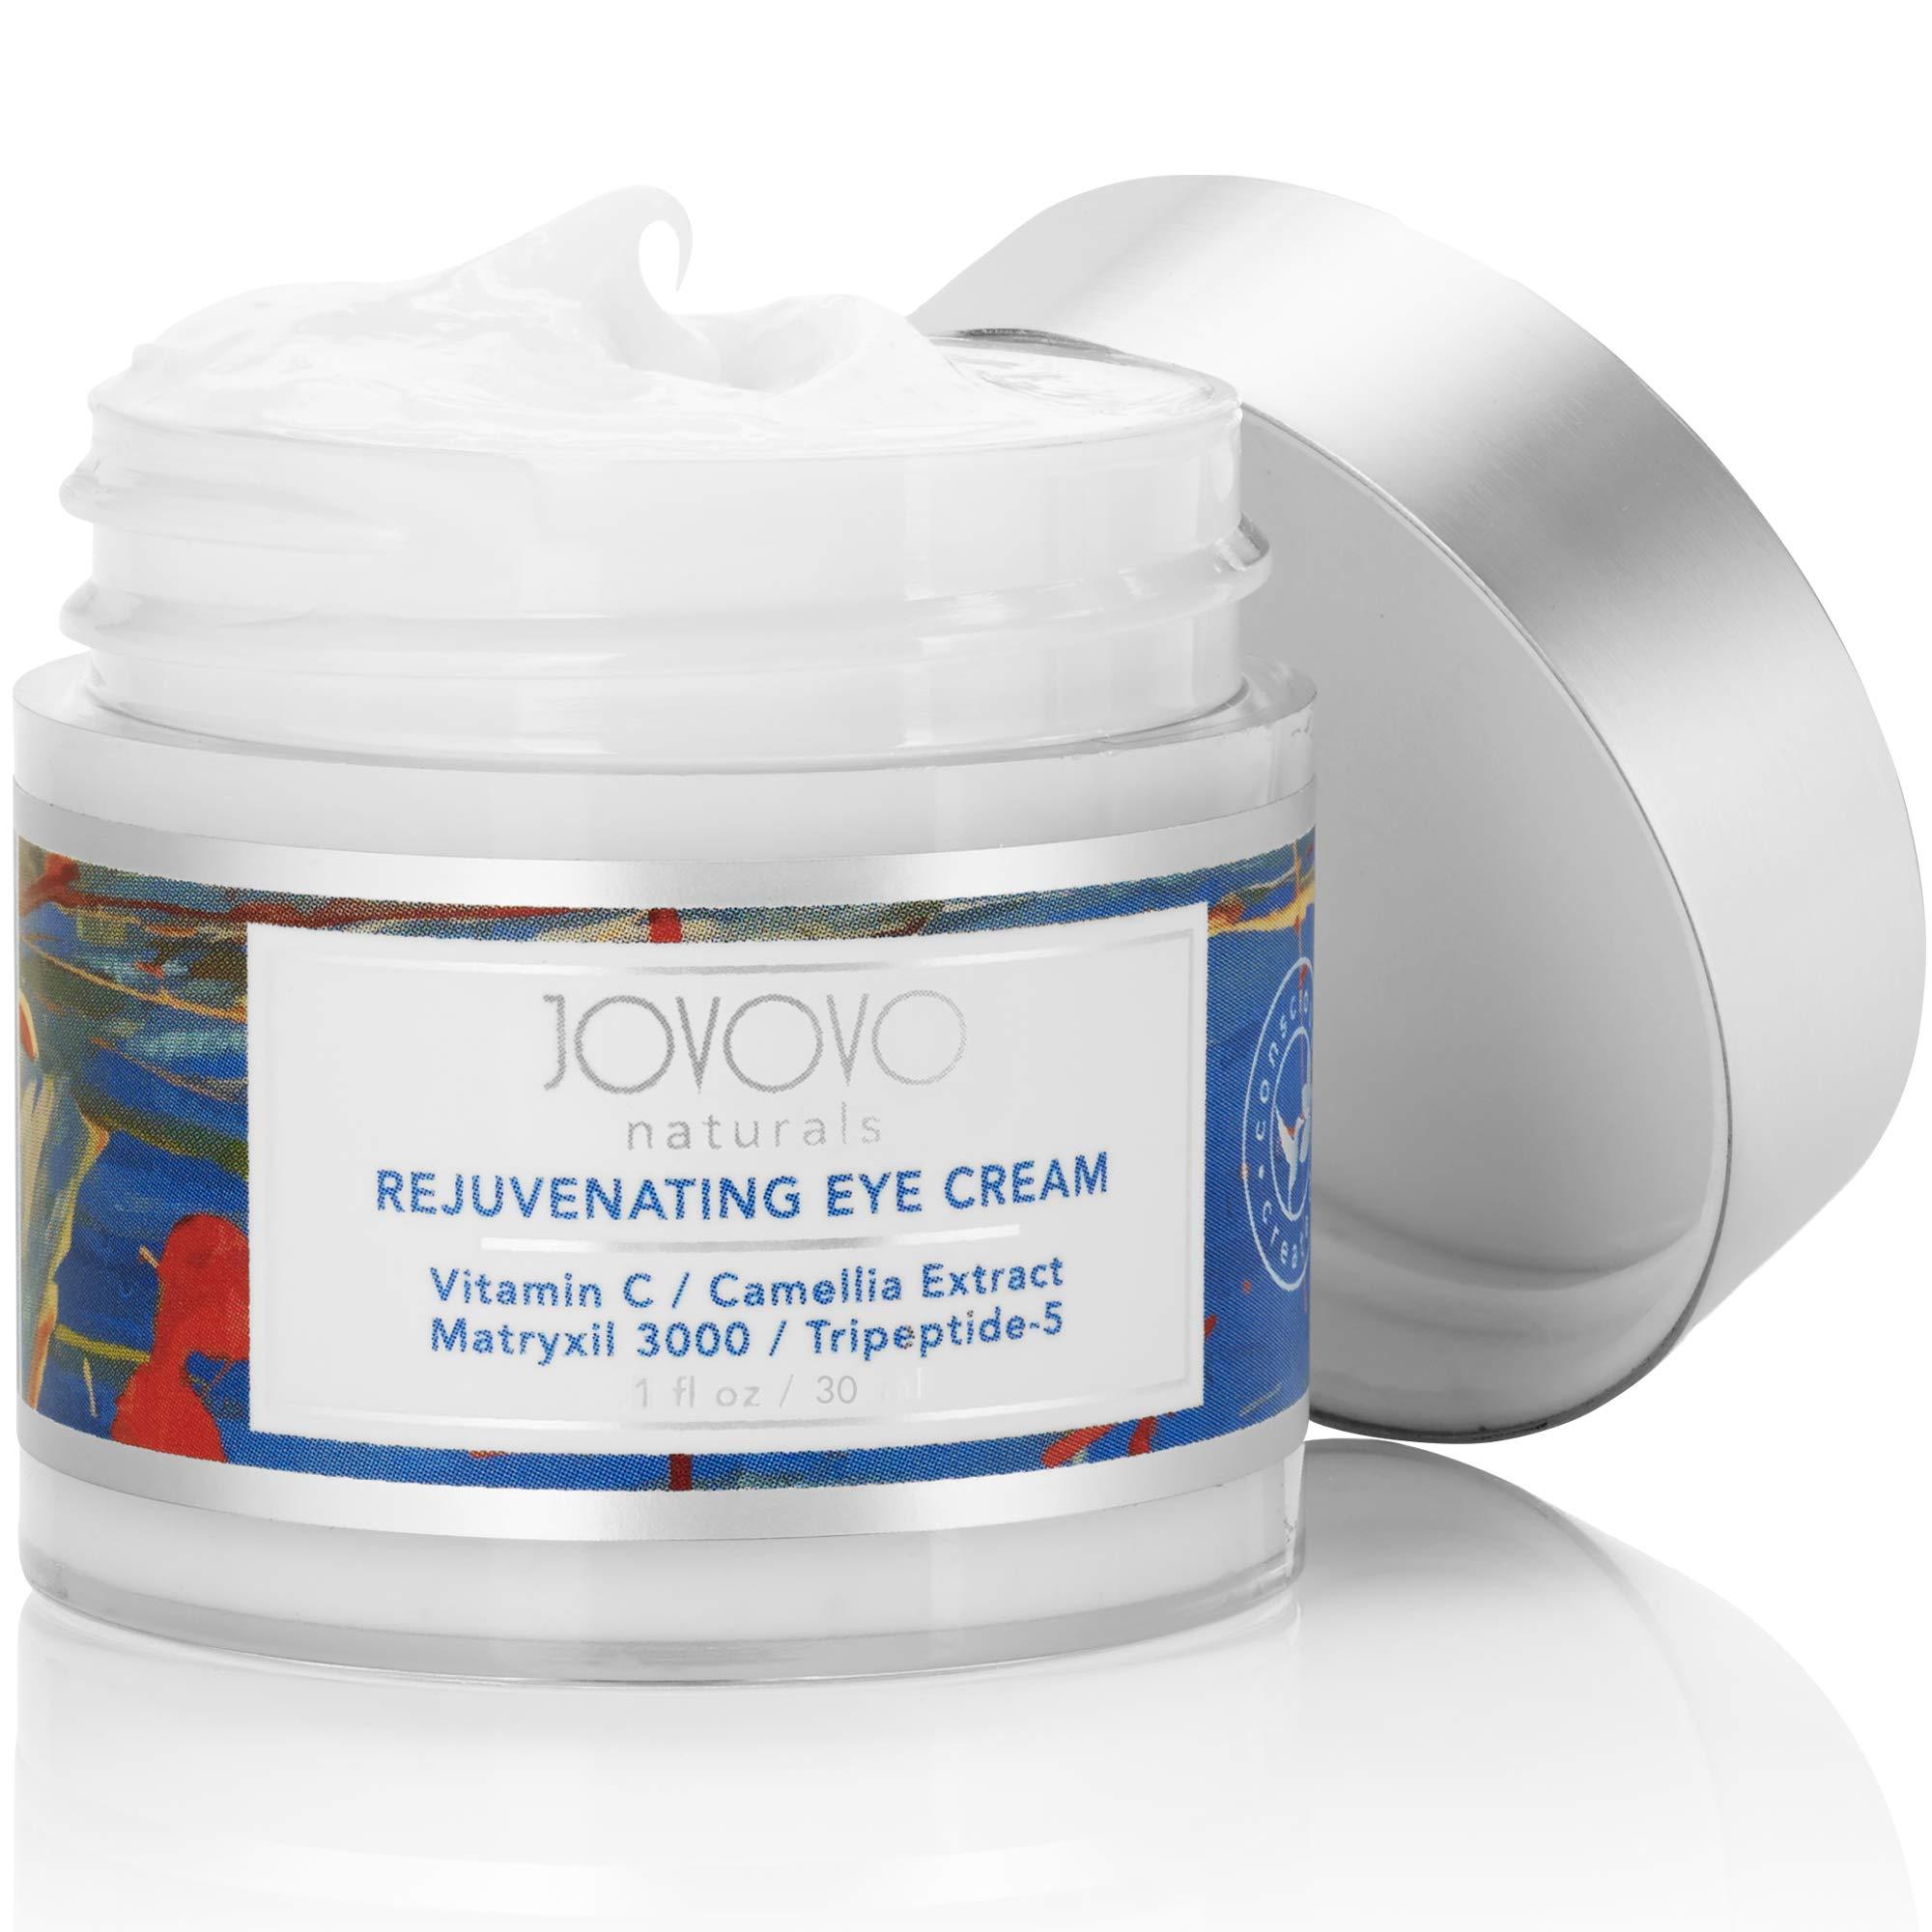 Eye Cream with Eye Treatment and Organic Anti-Aging Skin Care